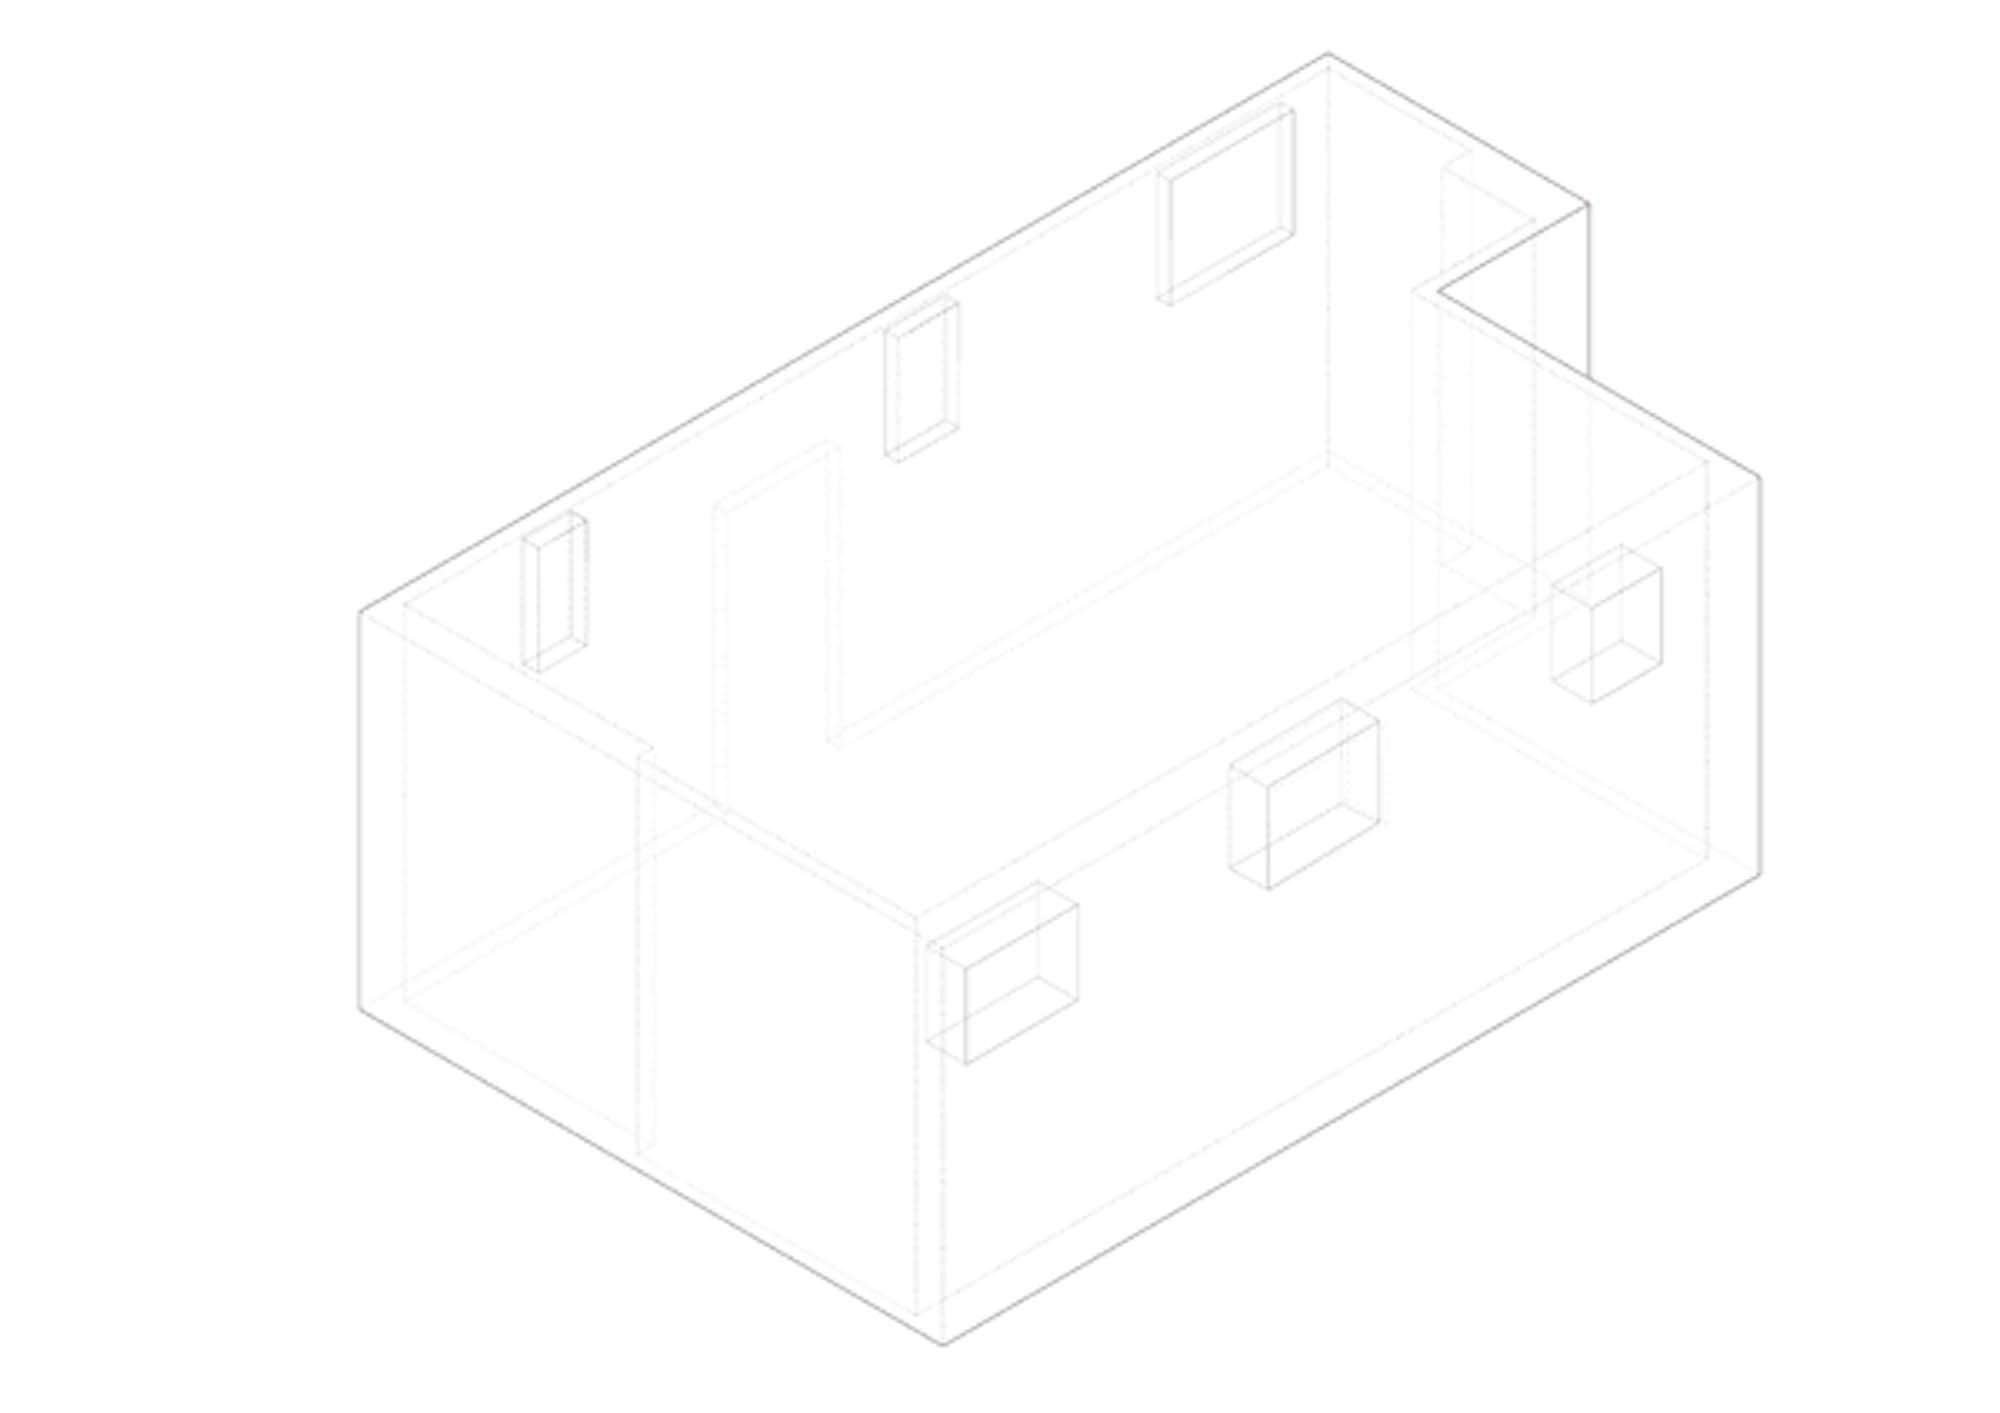 04 ANIMATED AXO VIEW.jpg